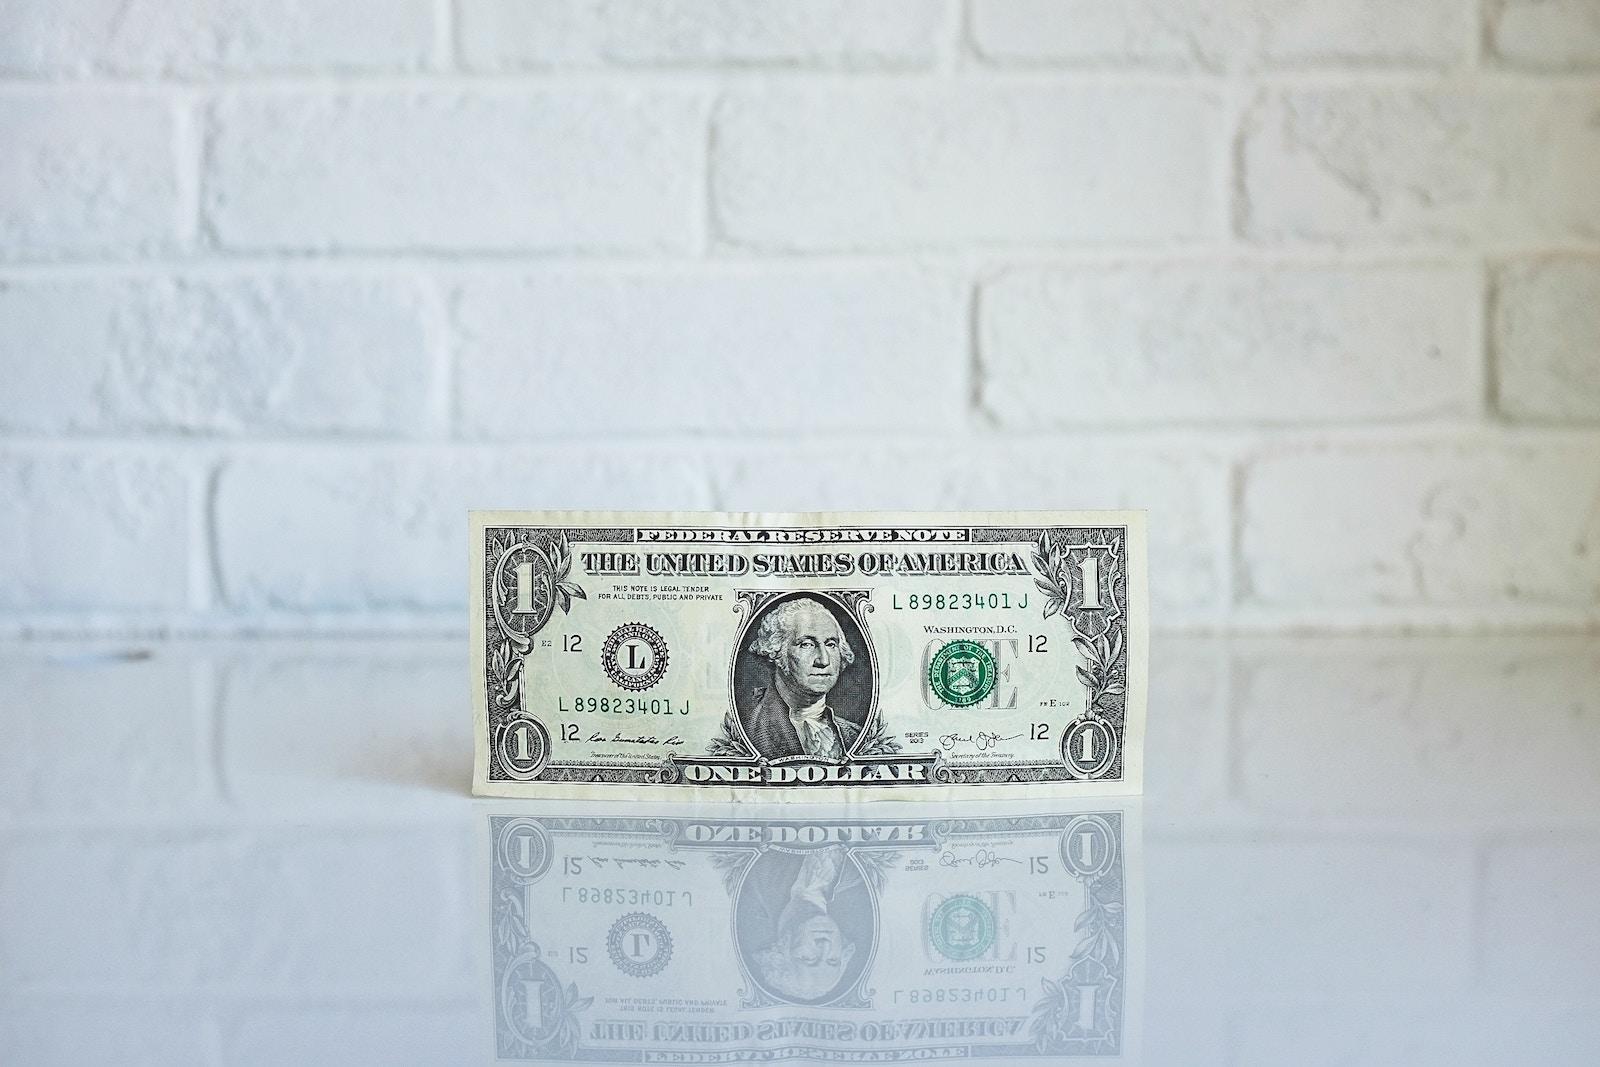 💳 TransferWise zapuskaje kartku ta onlajn-rahunok dlja mižnarodnyh perekaziv buď-kudy